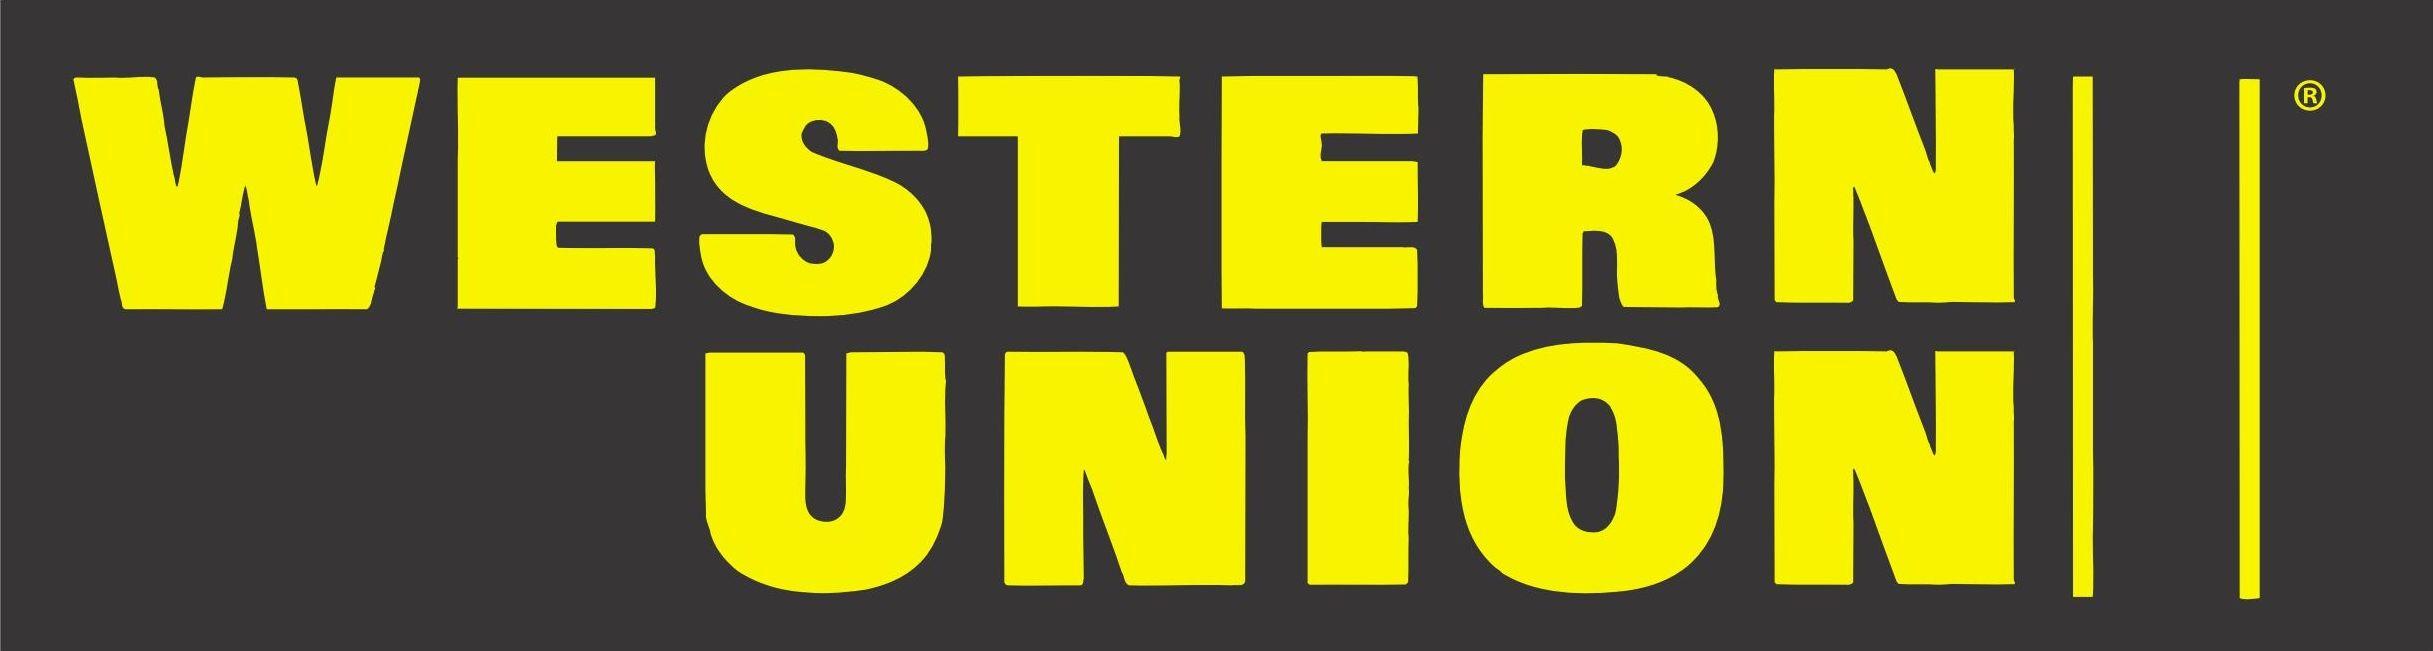 Western union logo clipart clip royalty free download western-union-logo | LogoMania | Union logo, Logos, Vector icons clip royalty free download